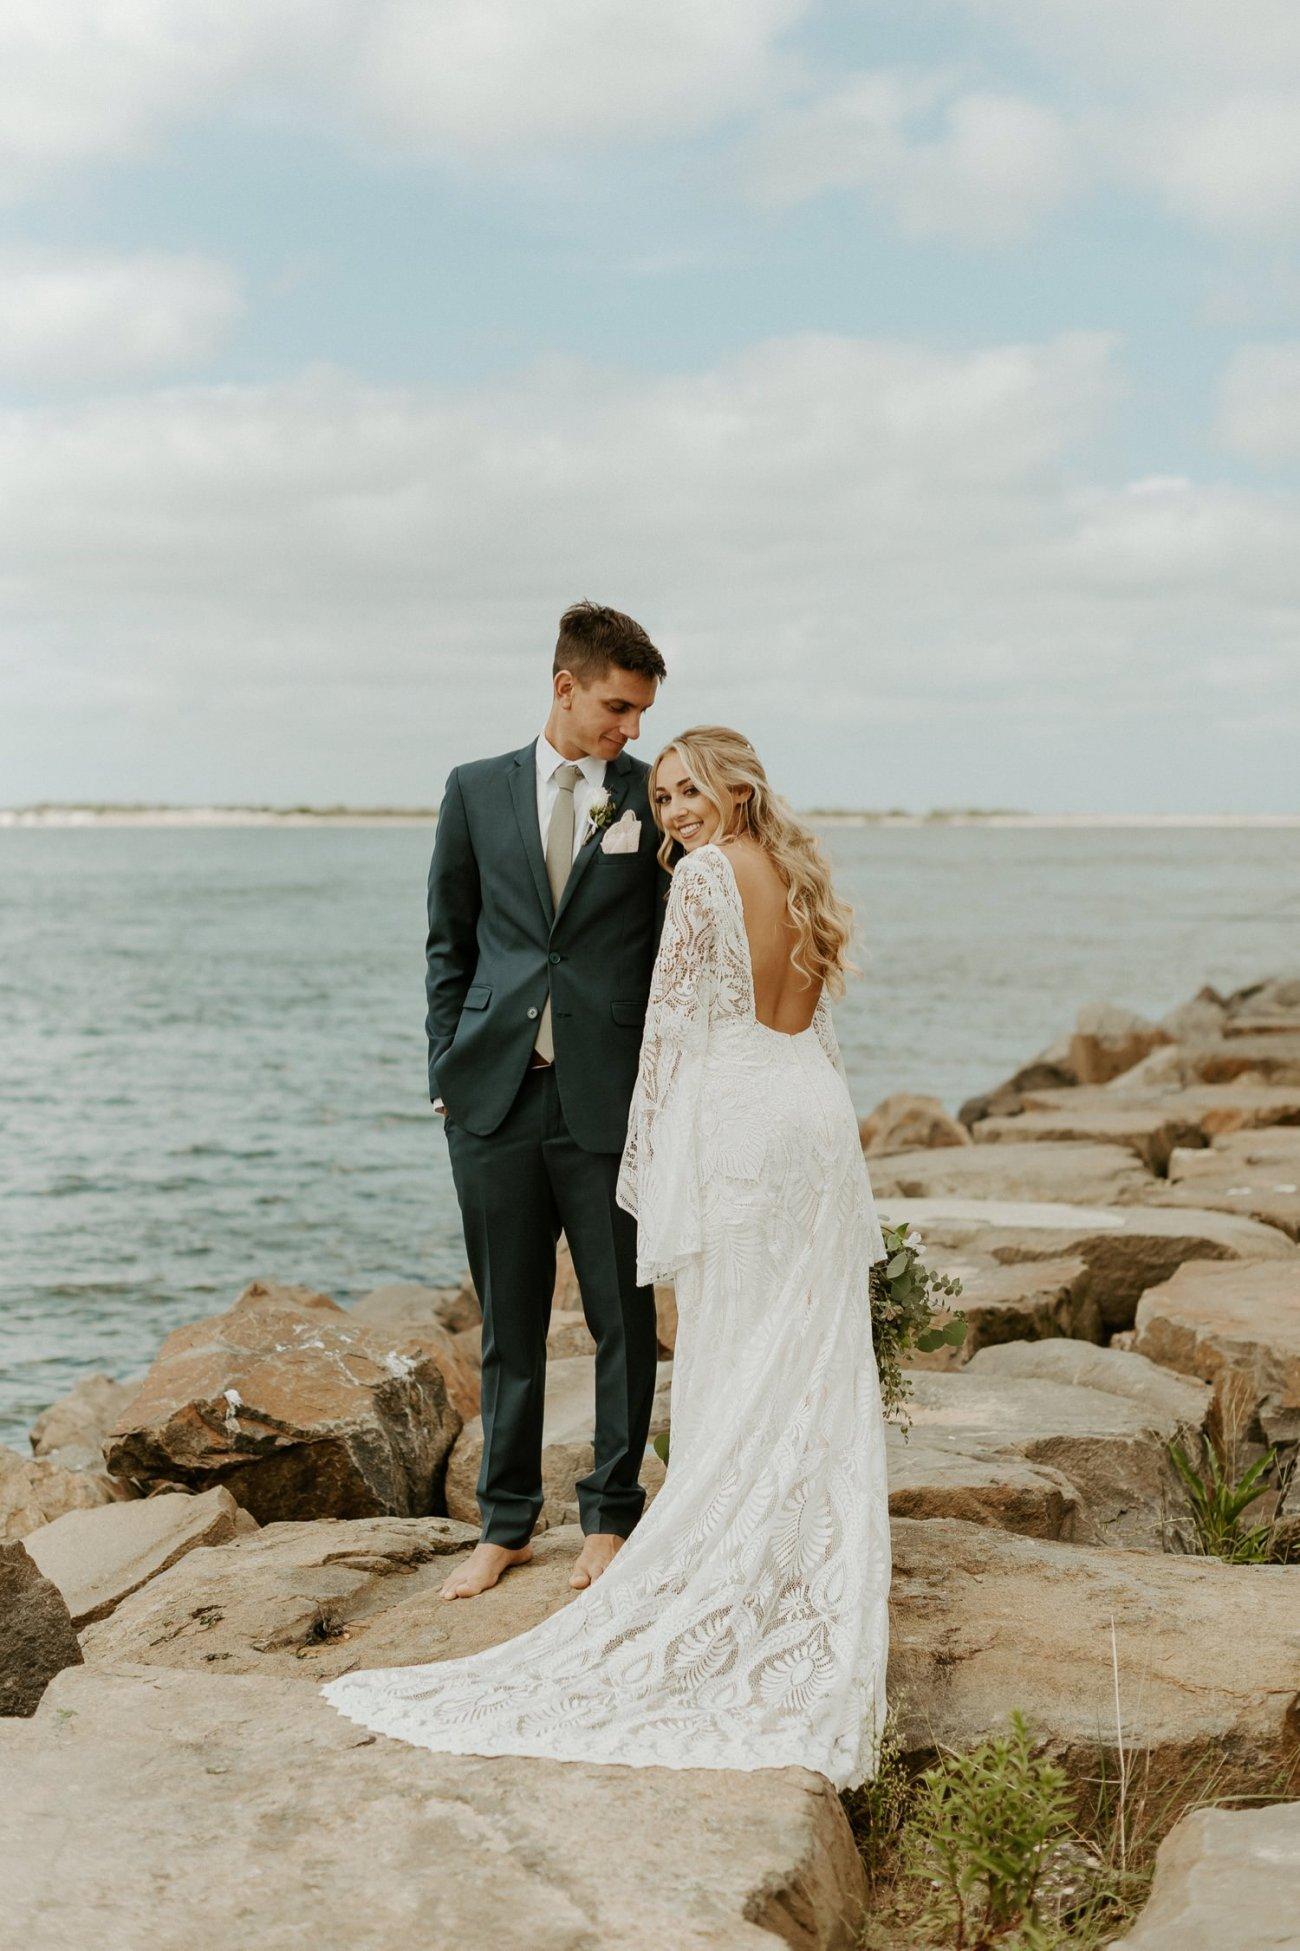 Long Beach Island Wedding Barnegat Lighthouse Wedding Ceremony New Jersey Wedding Anais Possamai Photography Oregon Wedding Photographer 0044